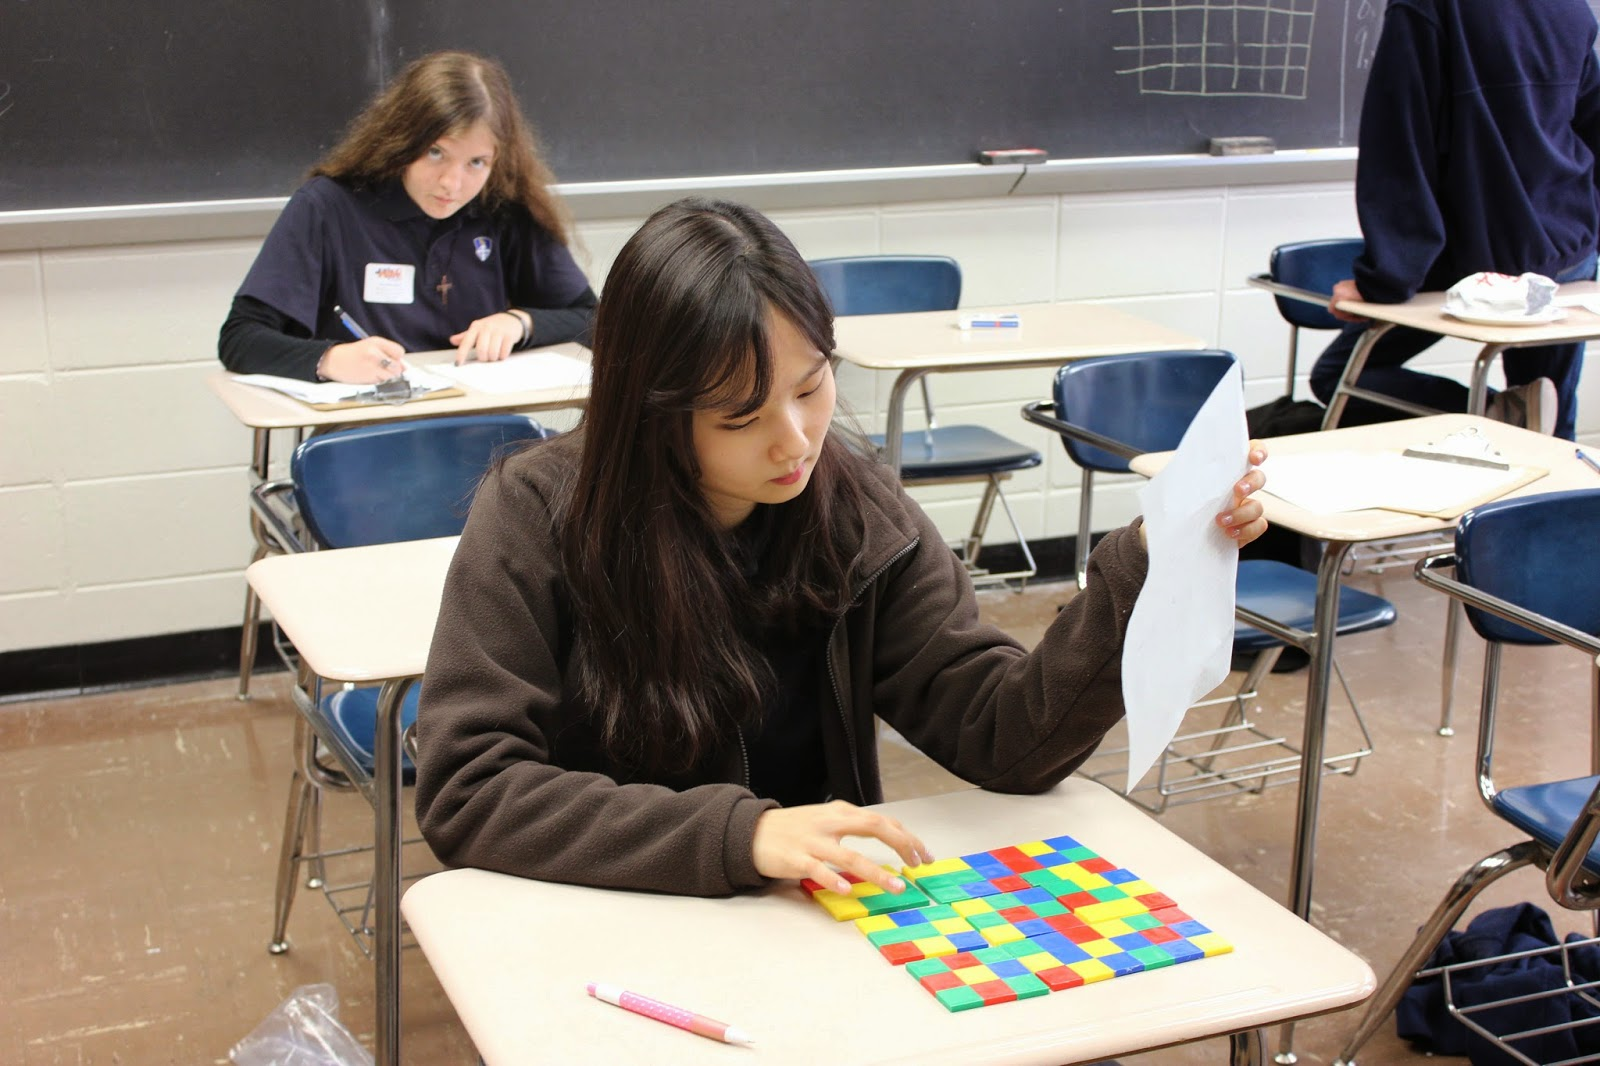 Montgomery Catholic Places 1st at AMP'd Puzzle Challenge 2